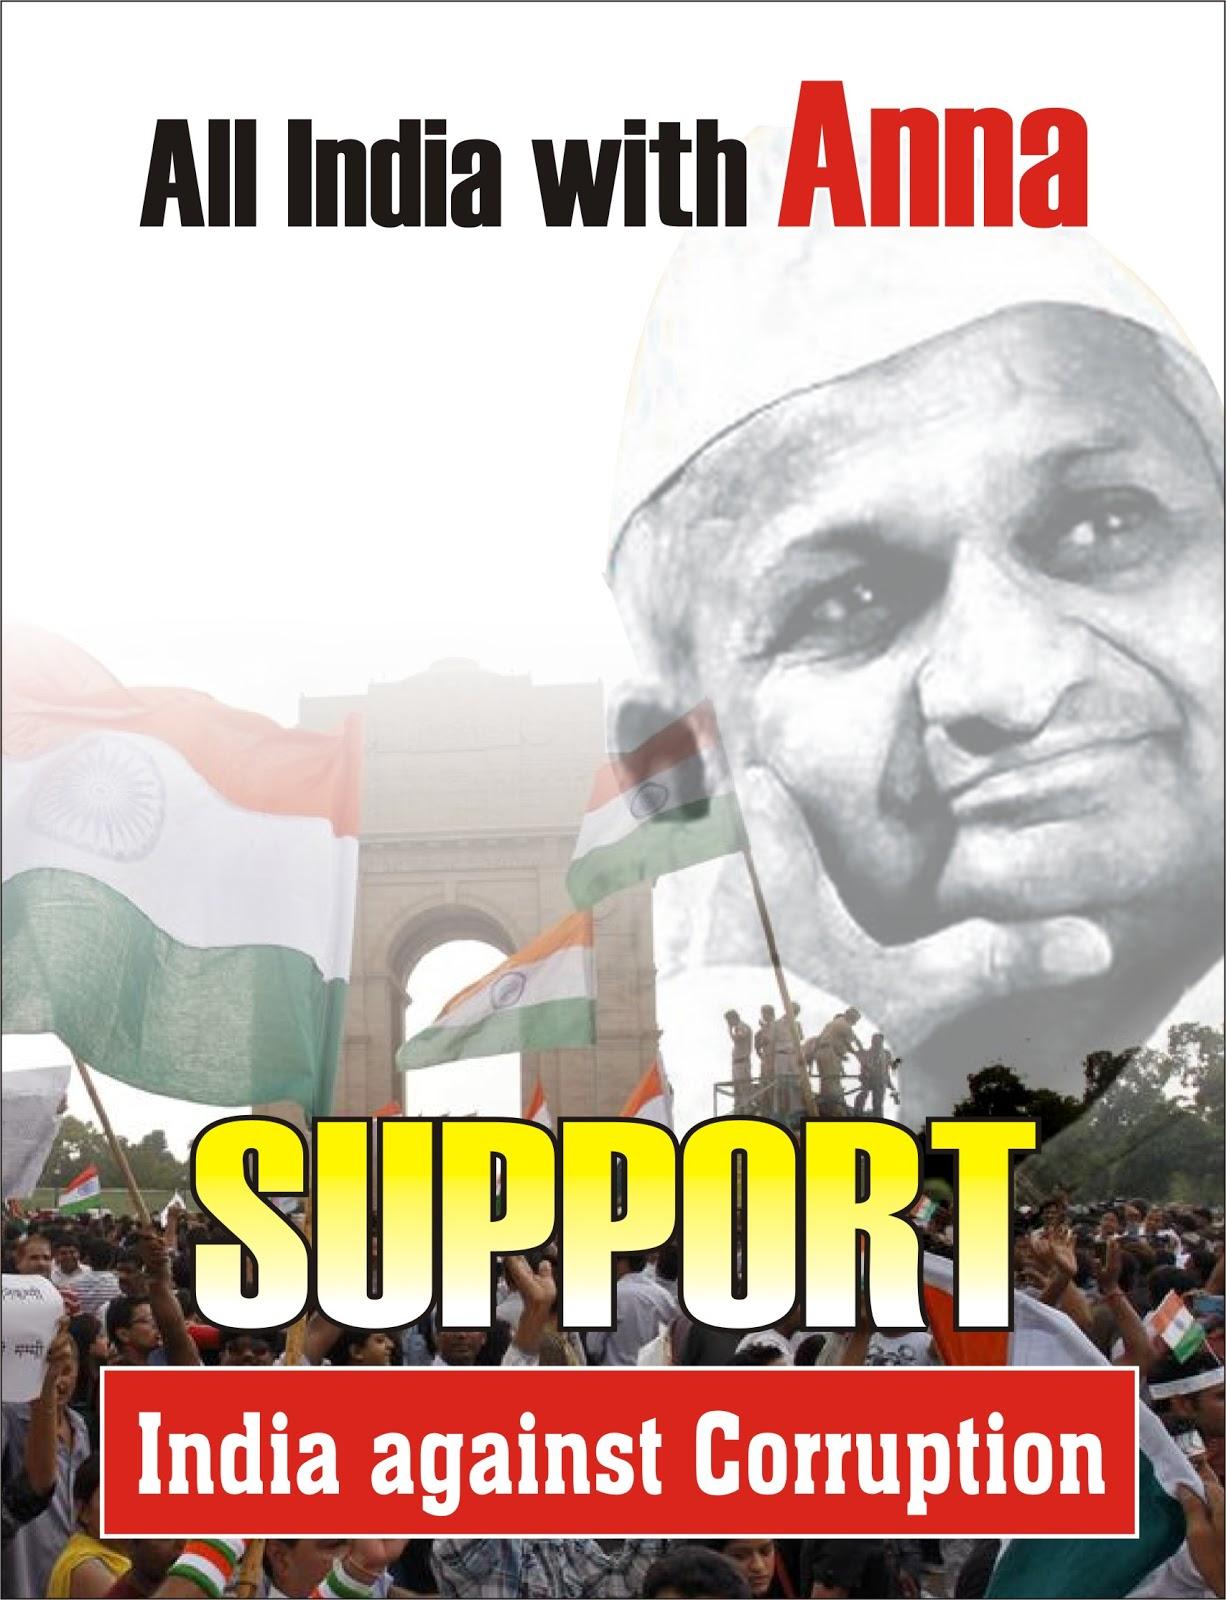 Corruption Poster: Fight against Corruption